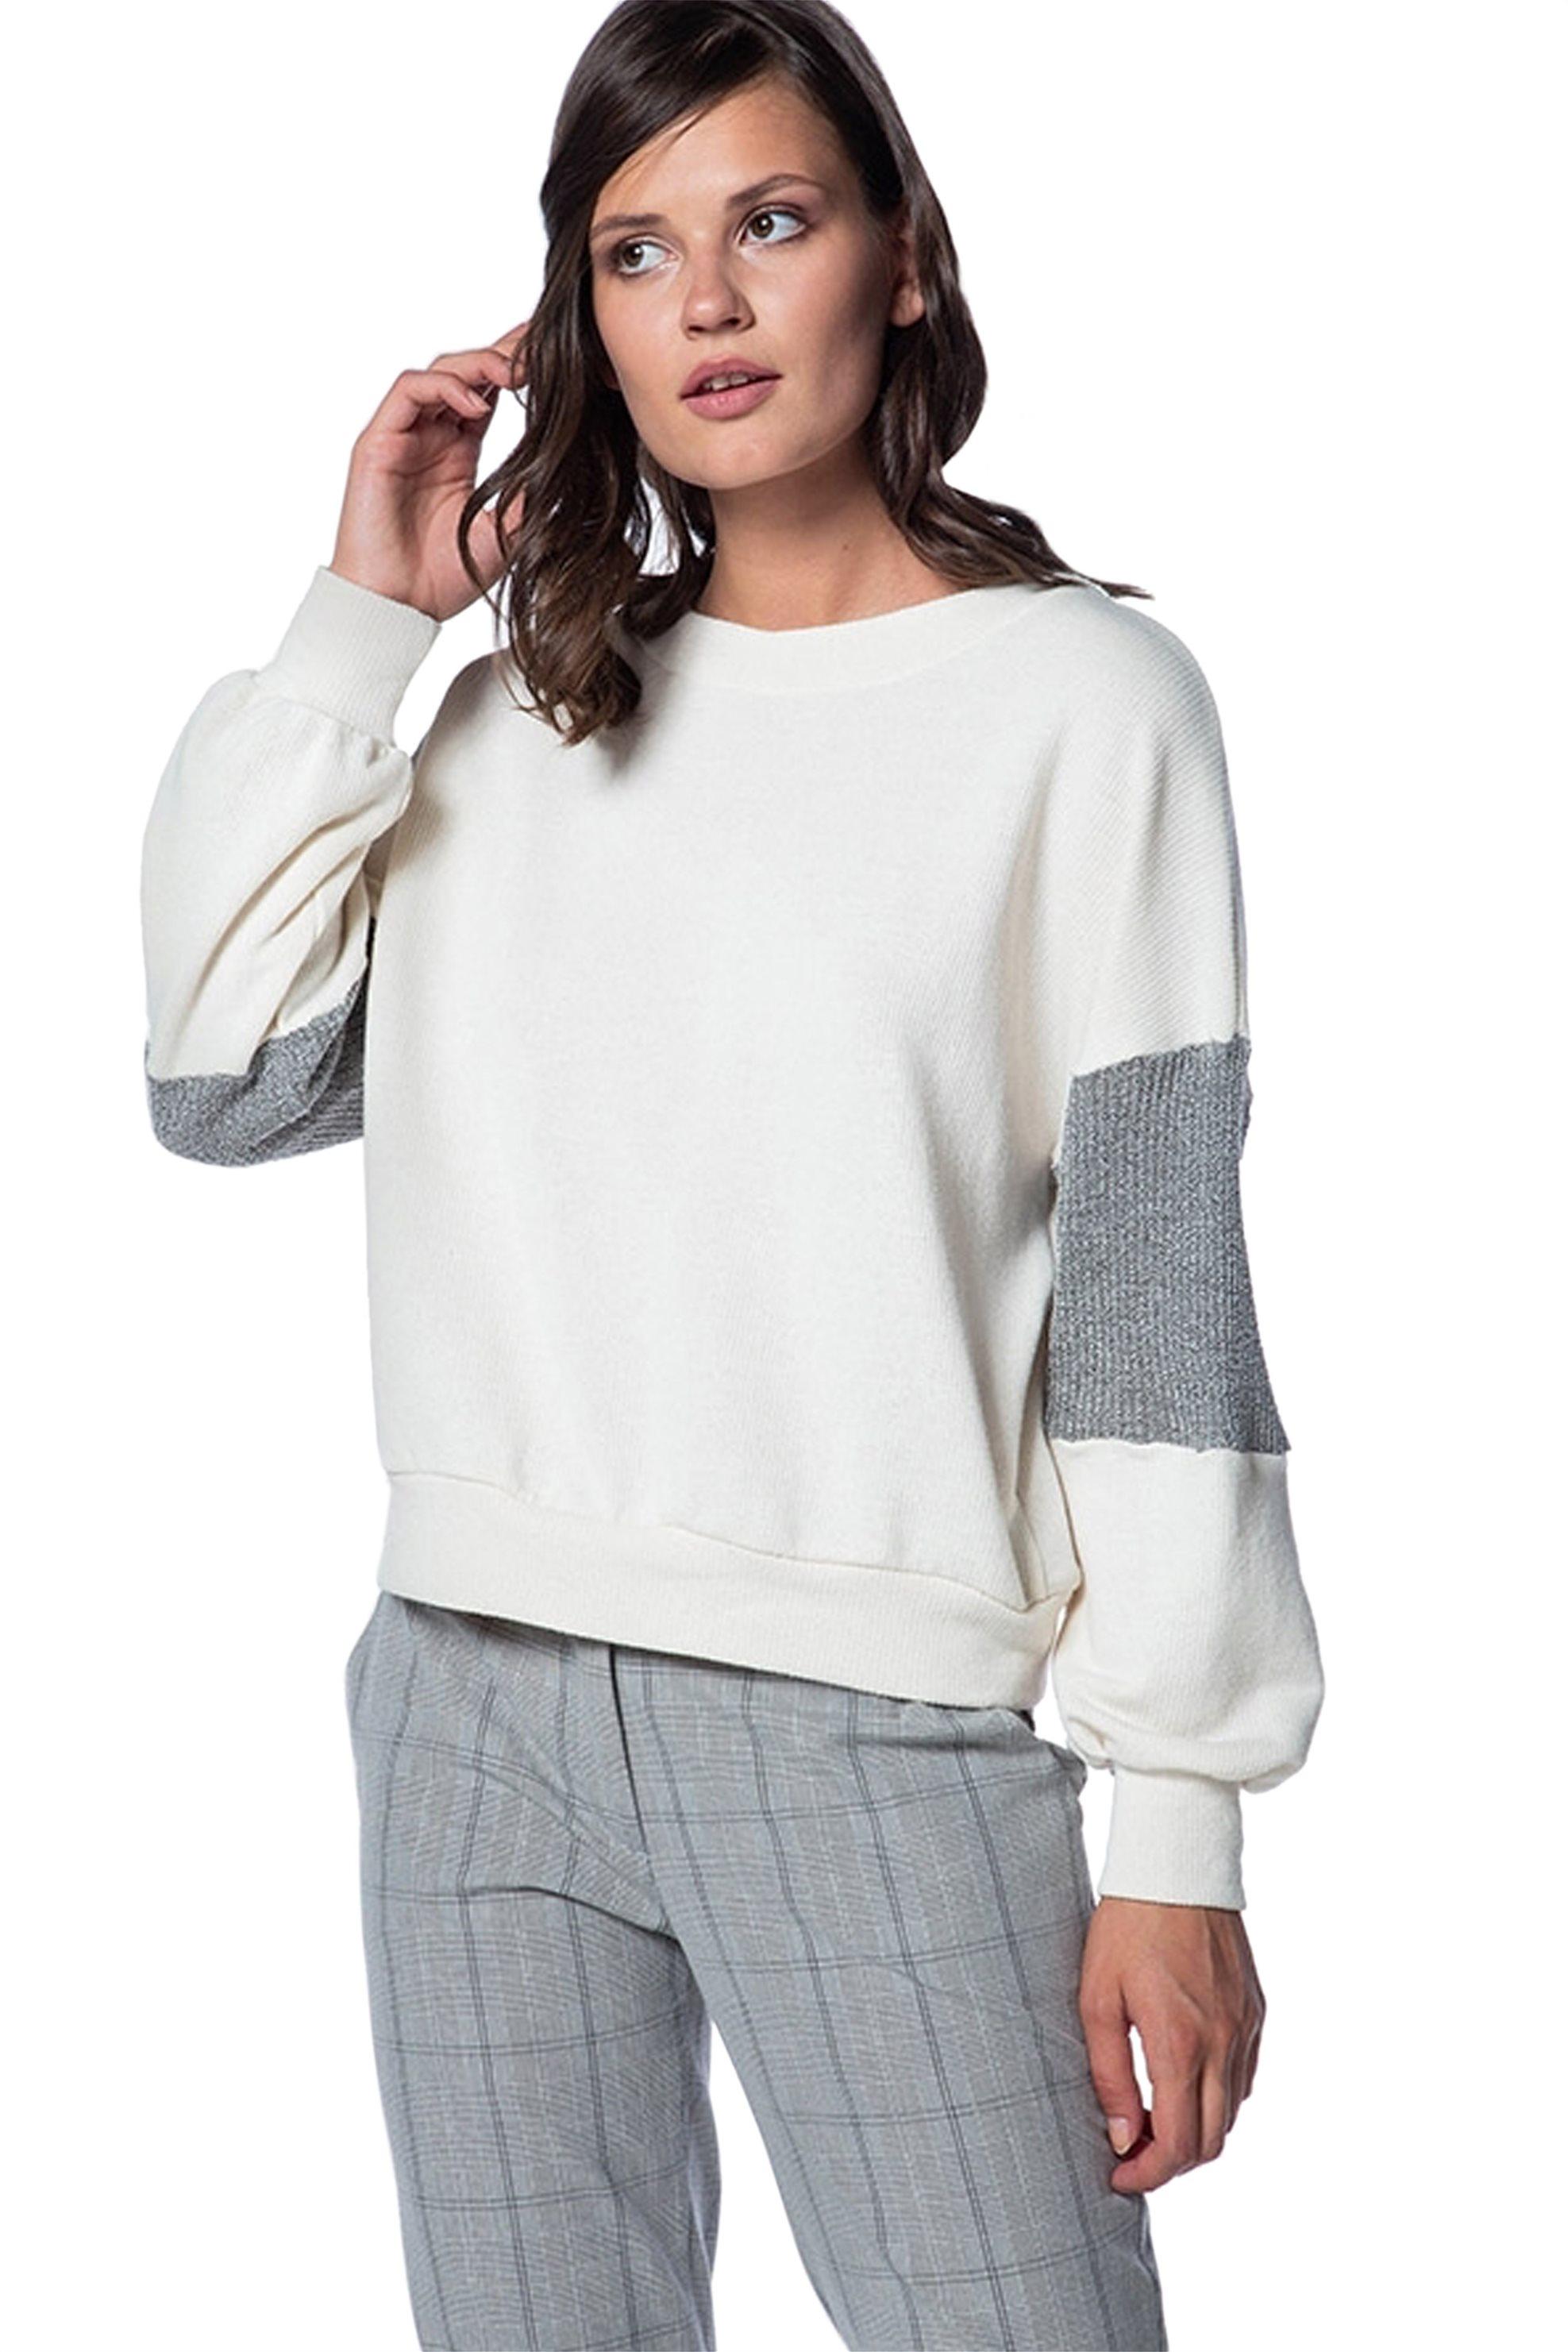 Helmi γυναικεία μπλούζα φούτερ με φαρδύ μανίκι - 42-03-041 - Κρέμ γυναικα   ρουχα   tops   φούτερ μπλούζες   ζακέτες   μπλούζες   casual